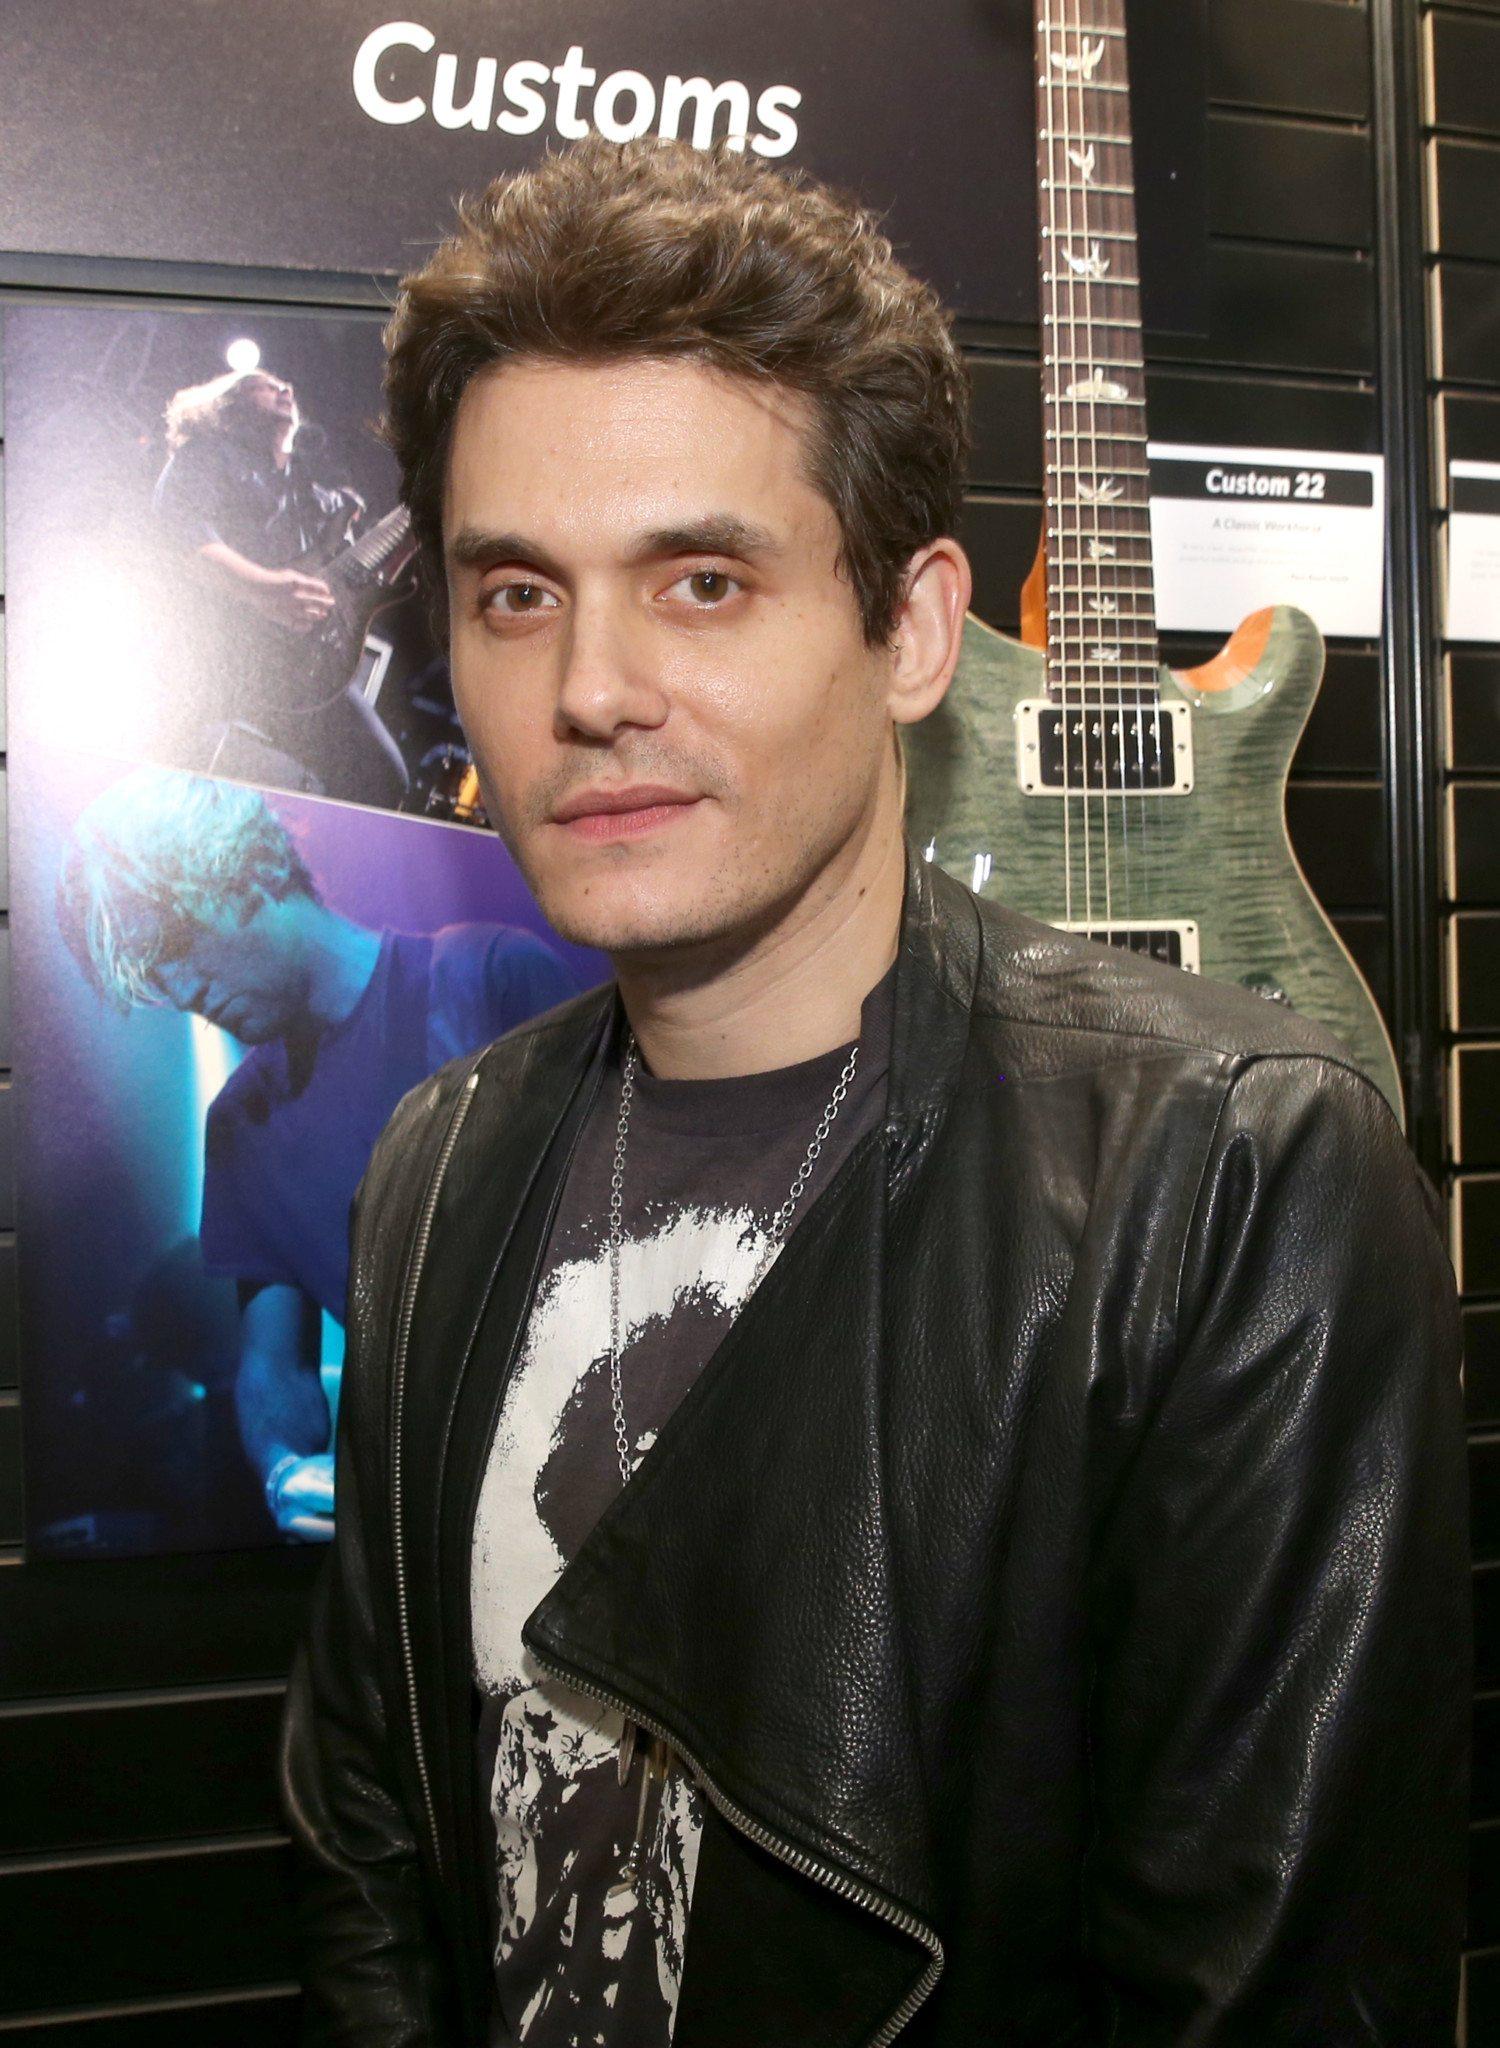 John Mayer photo